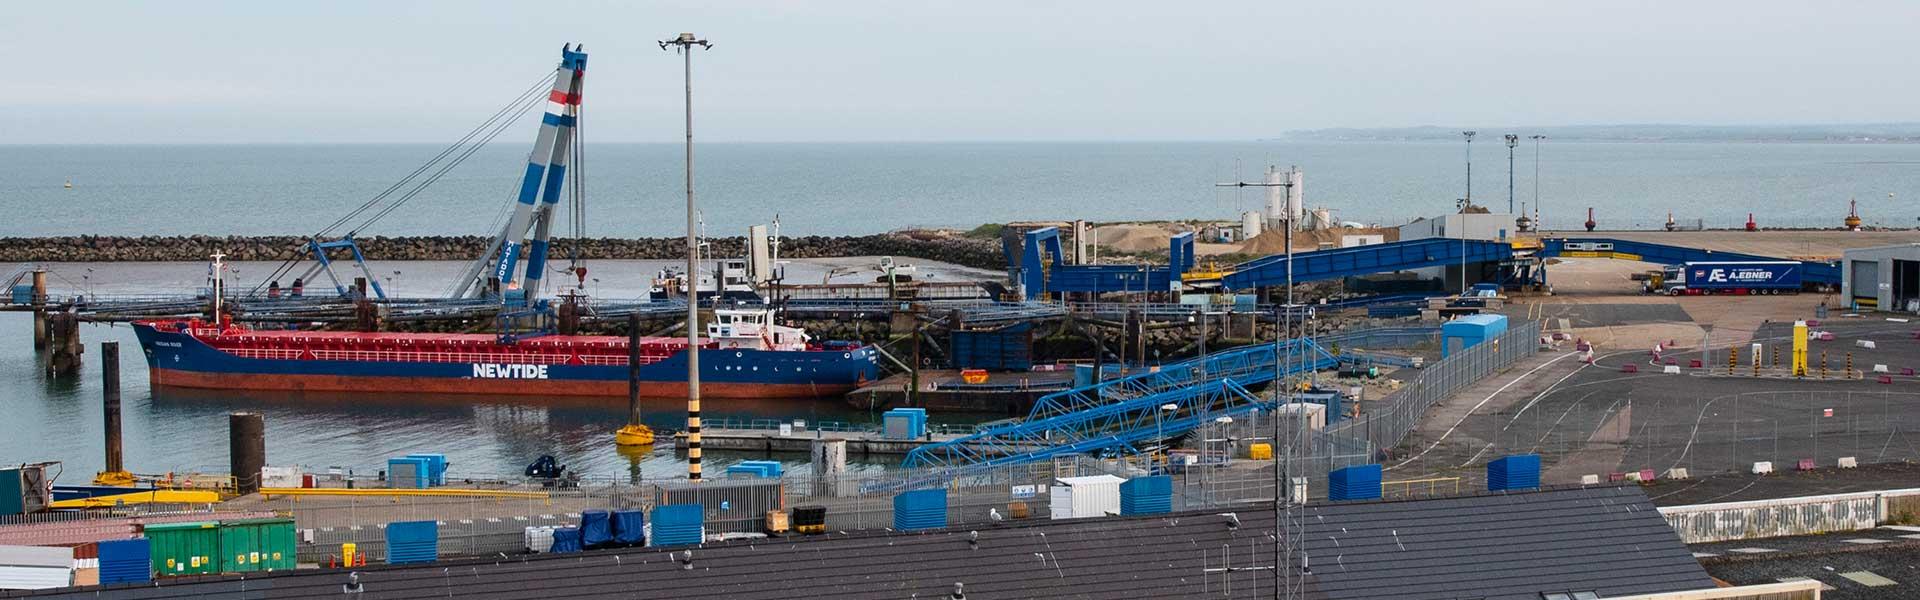 Ramsgate Port story header image